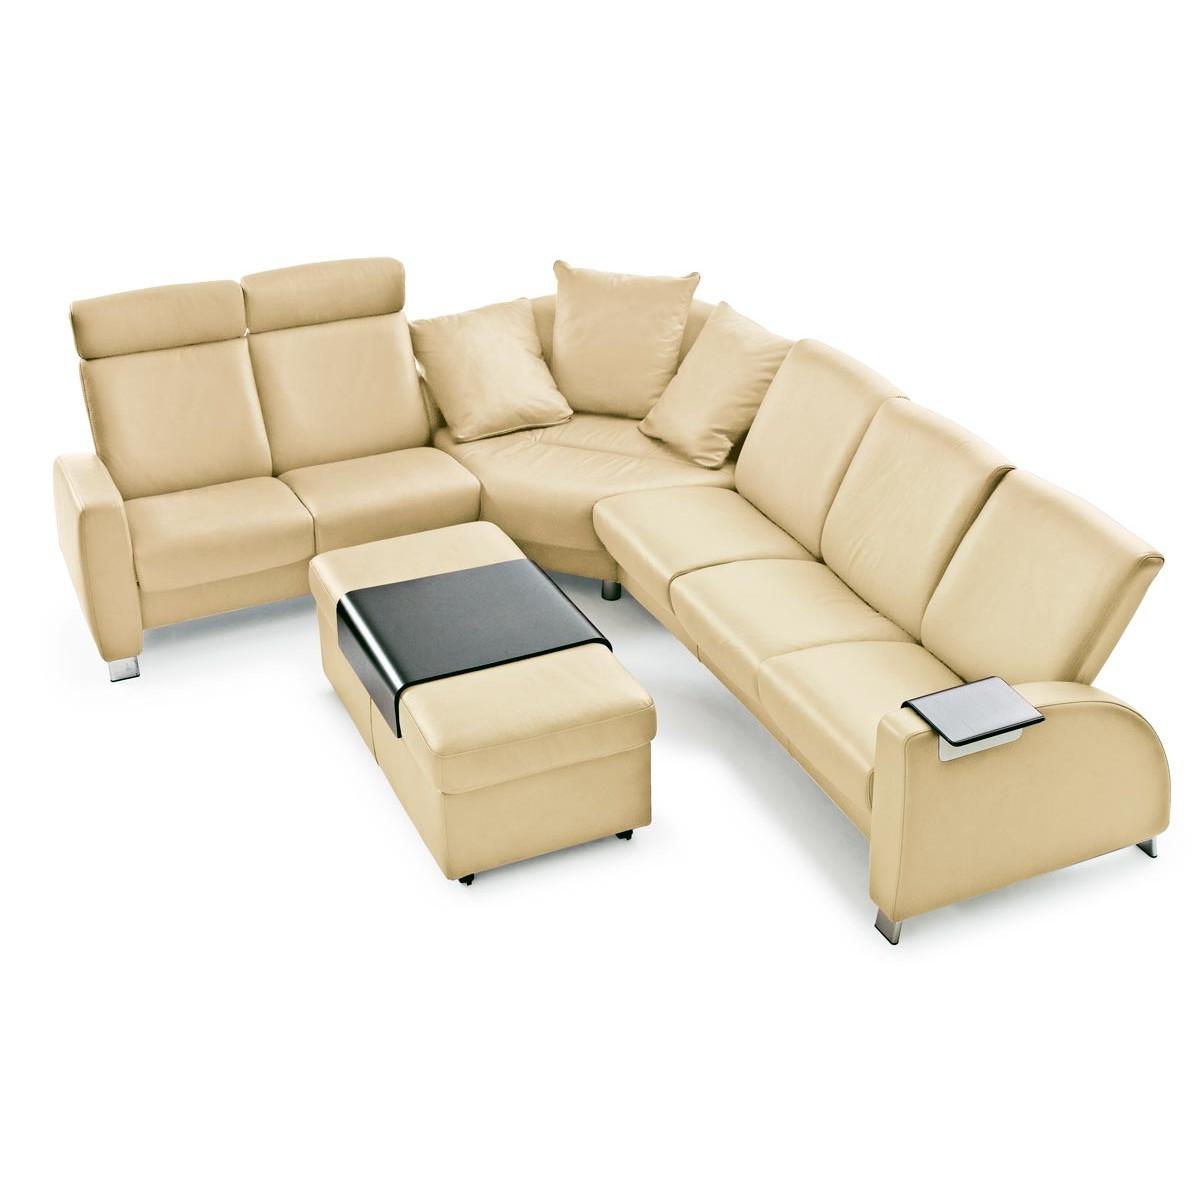 Sofas Stressless Whdr Stressless Arion Low Back sofa